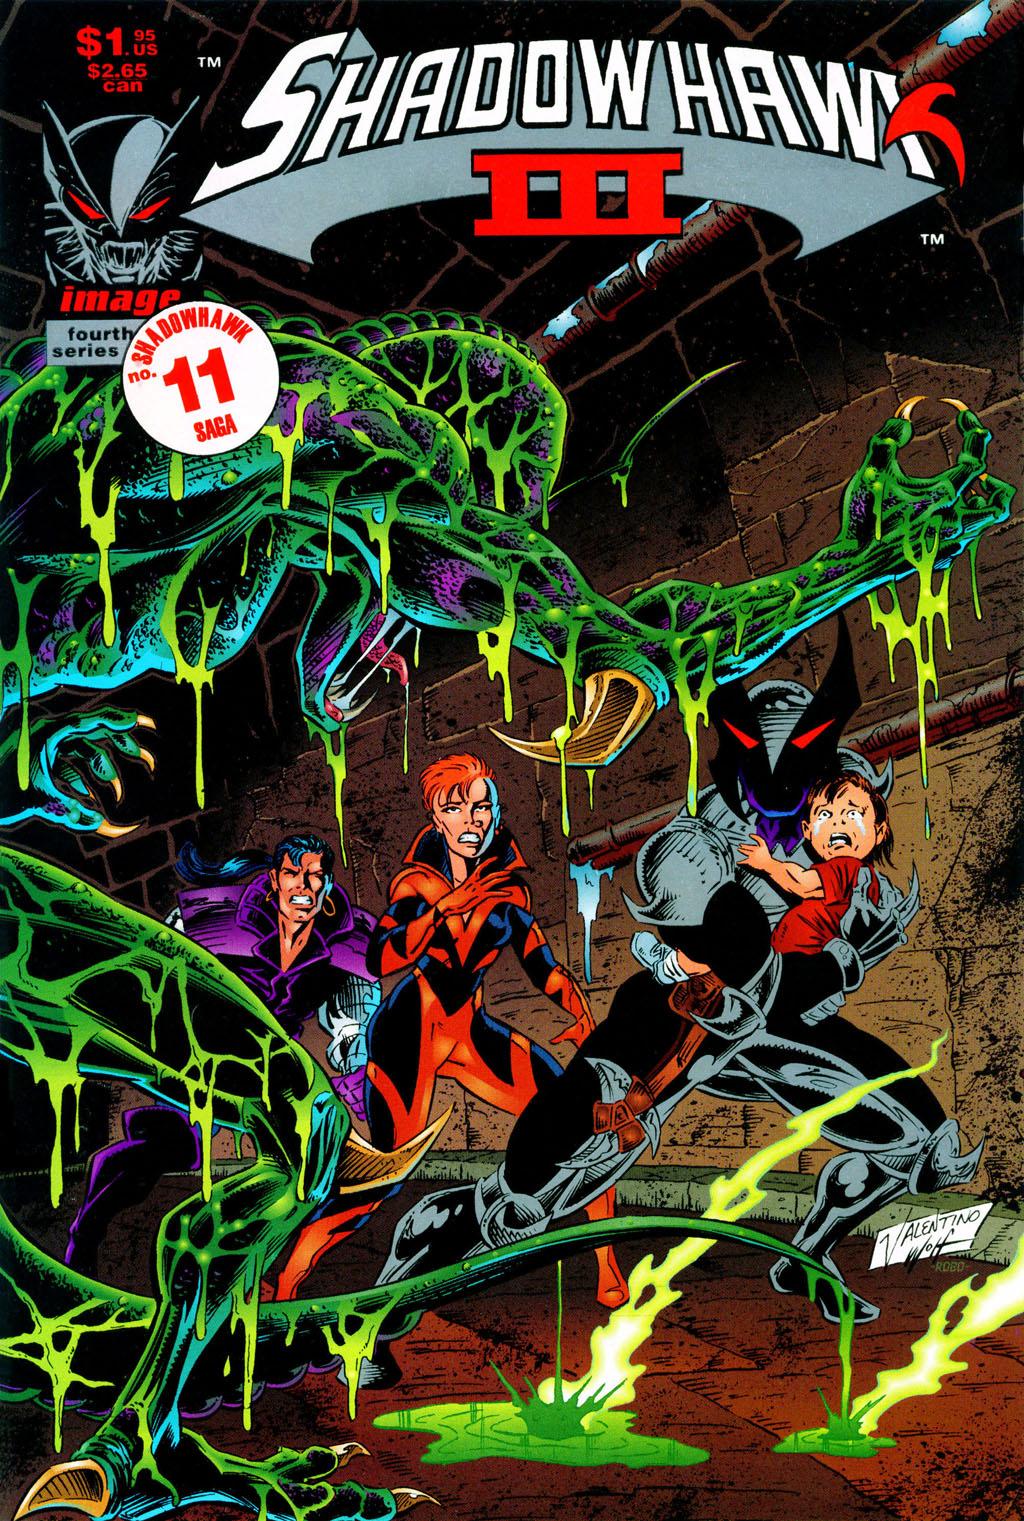 Read online ShadowHawk comic -  Issue #11 - 1